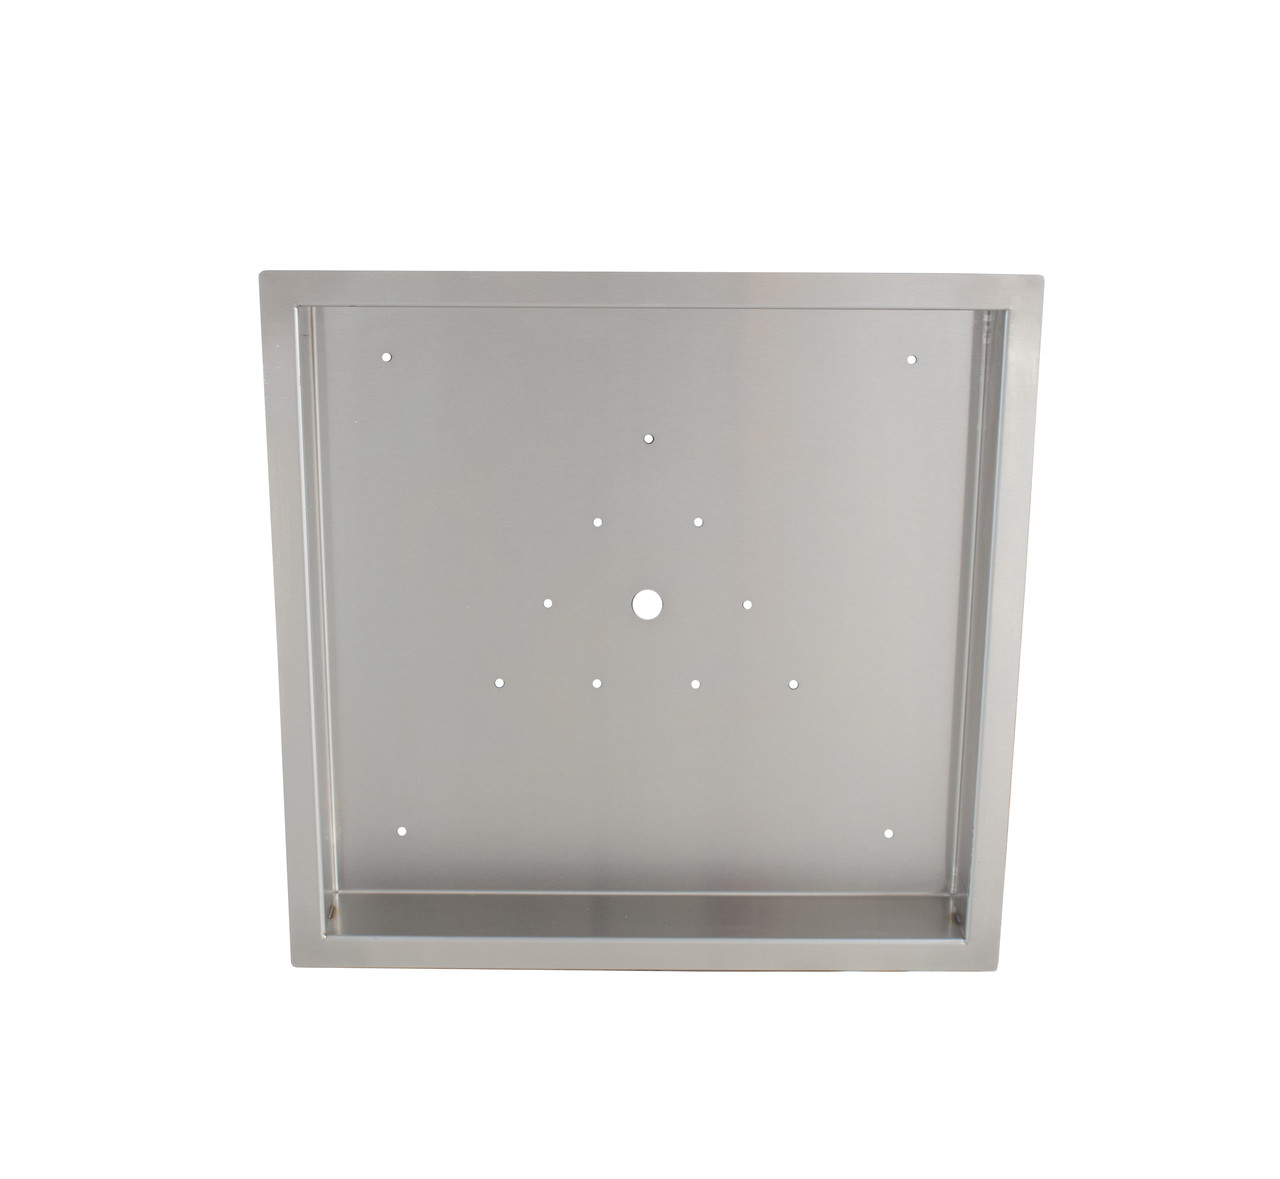 Firenado 36-Inch Drop-In Square Stainless Steel Burner Pan